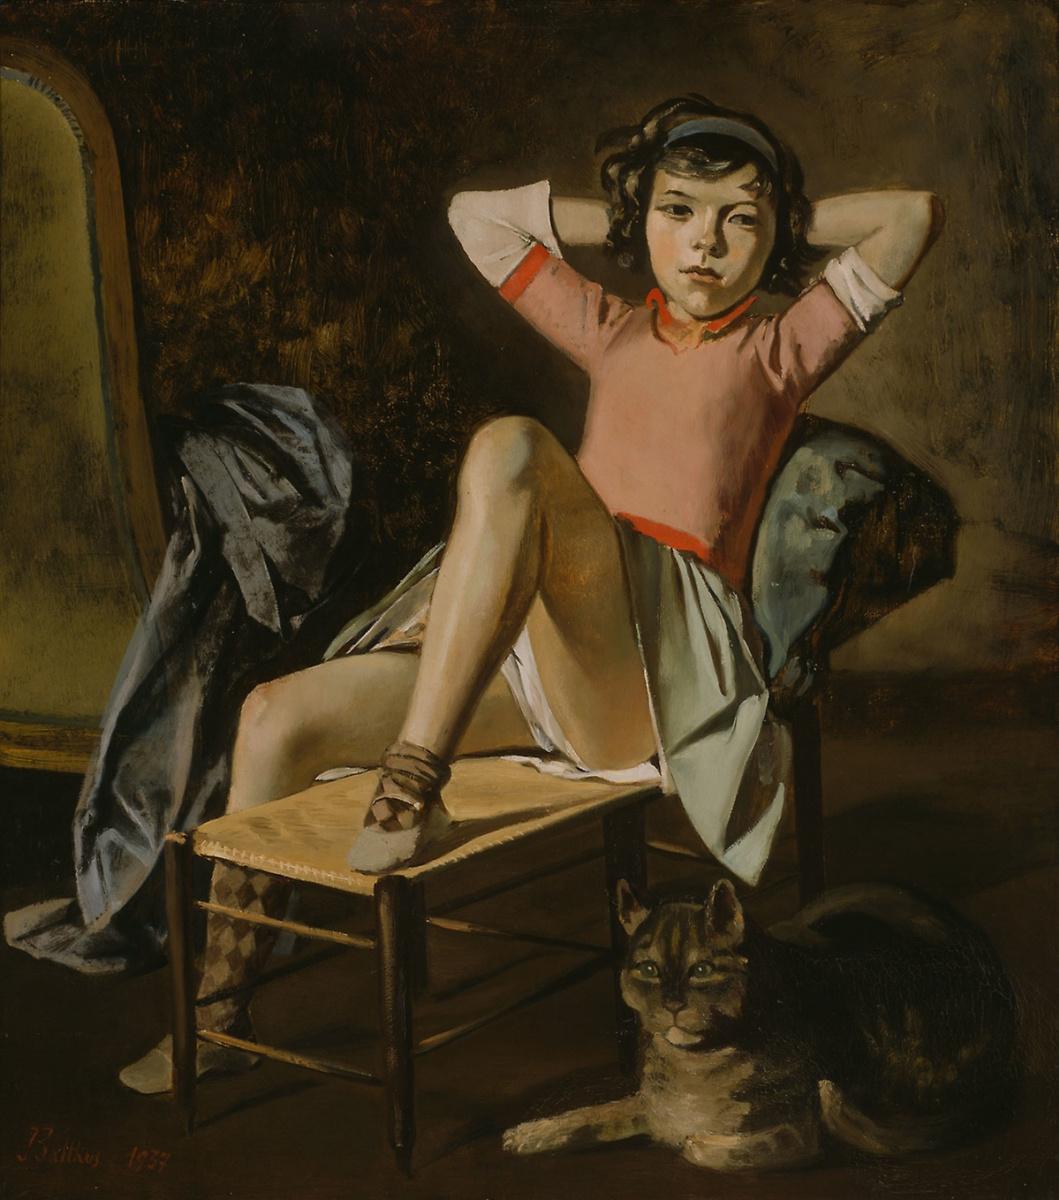 Balthus (Balthasar Klossovsky de Rola). Girl with Cat